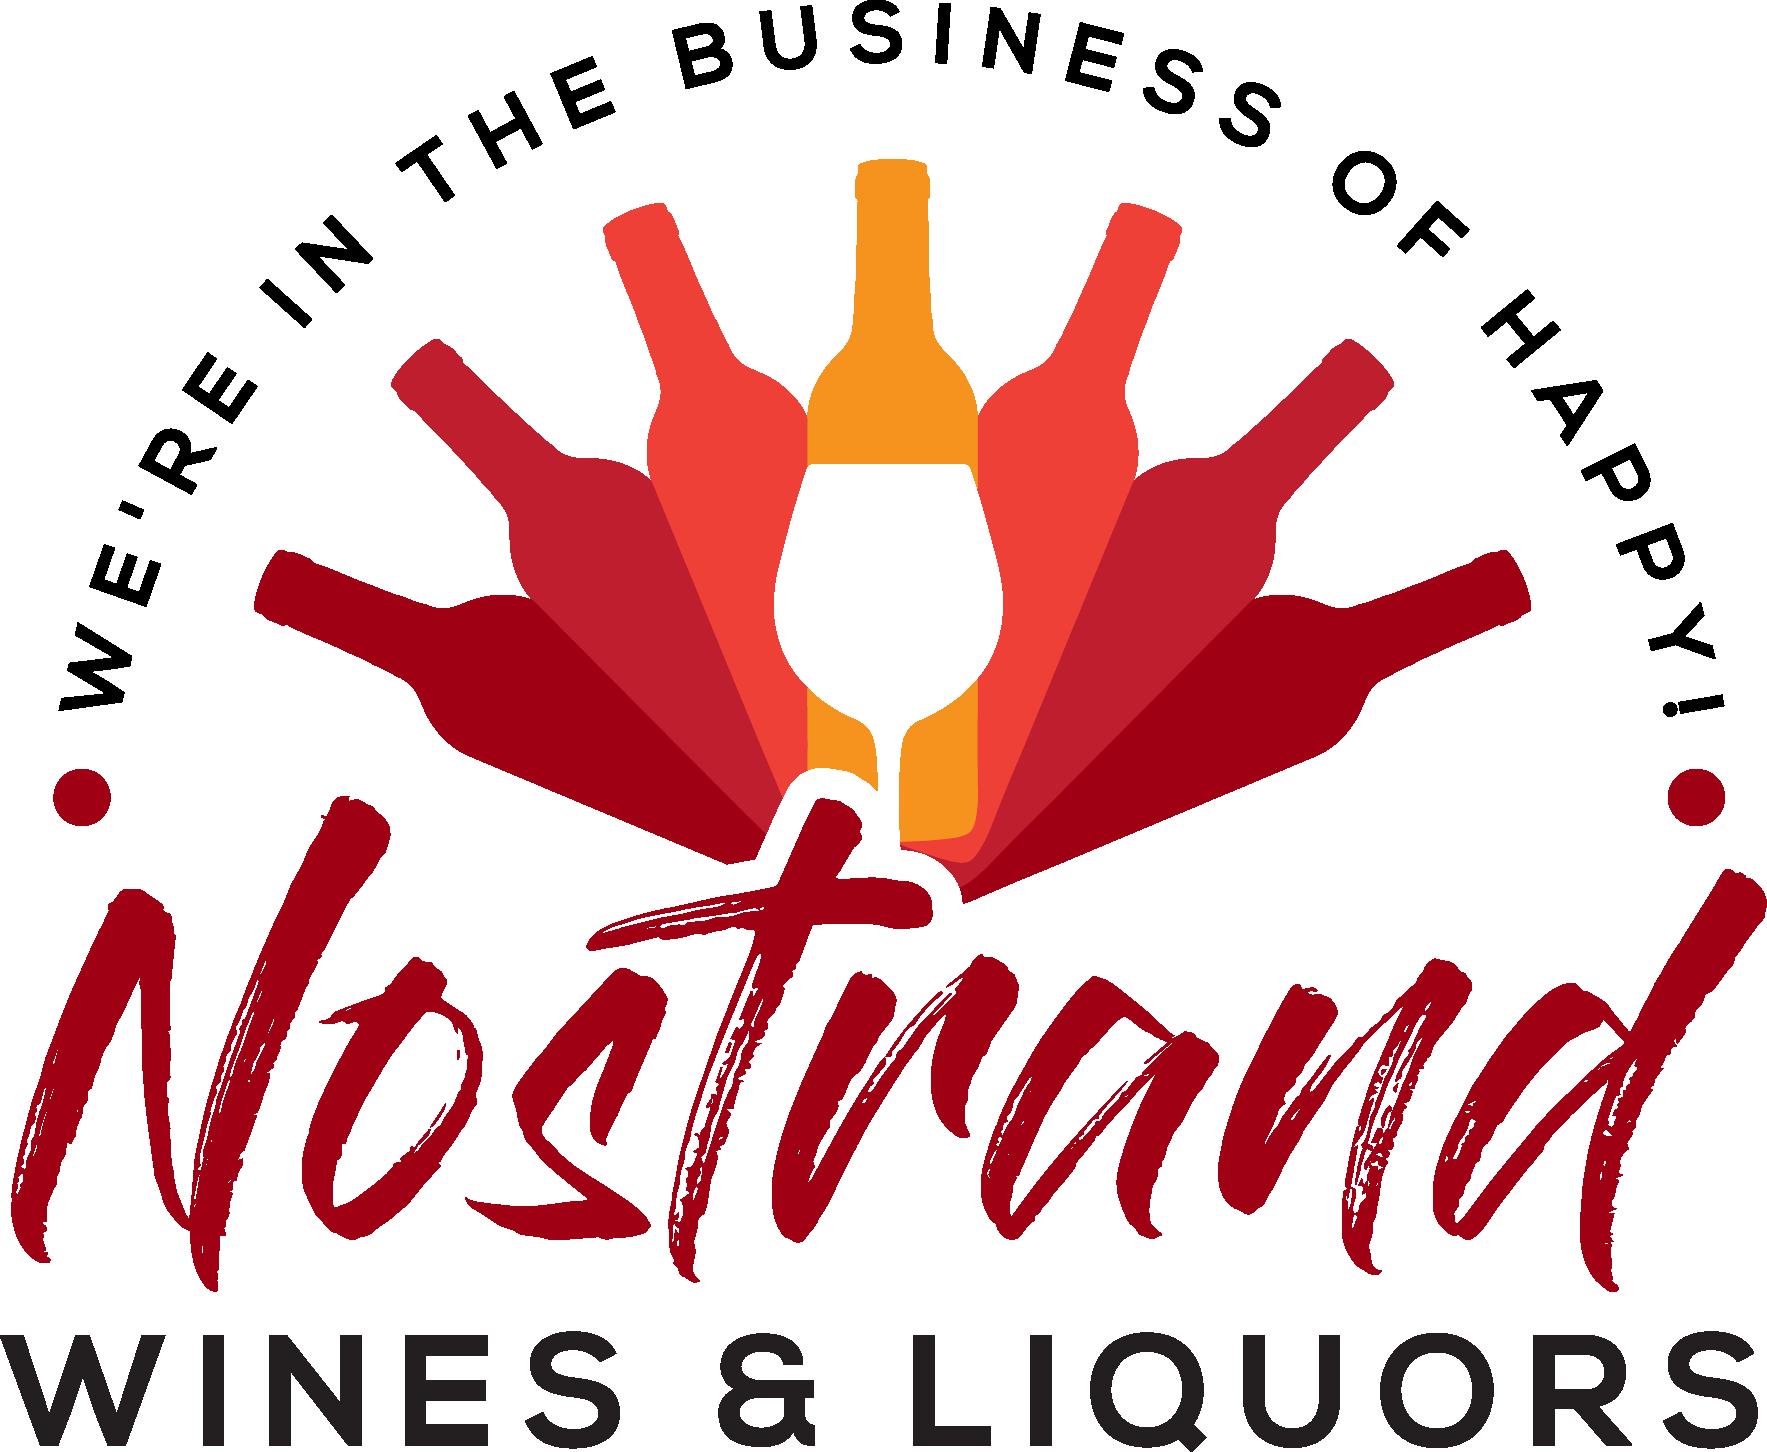 Nostrand Wines & Liquors